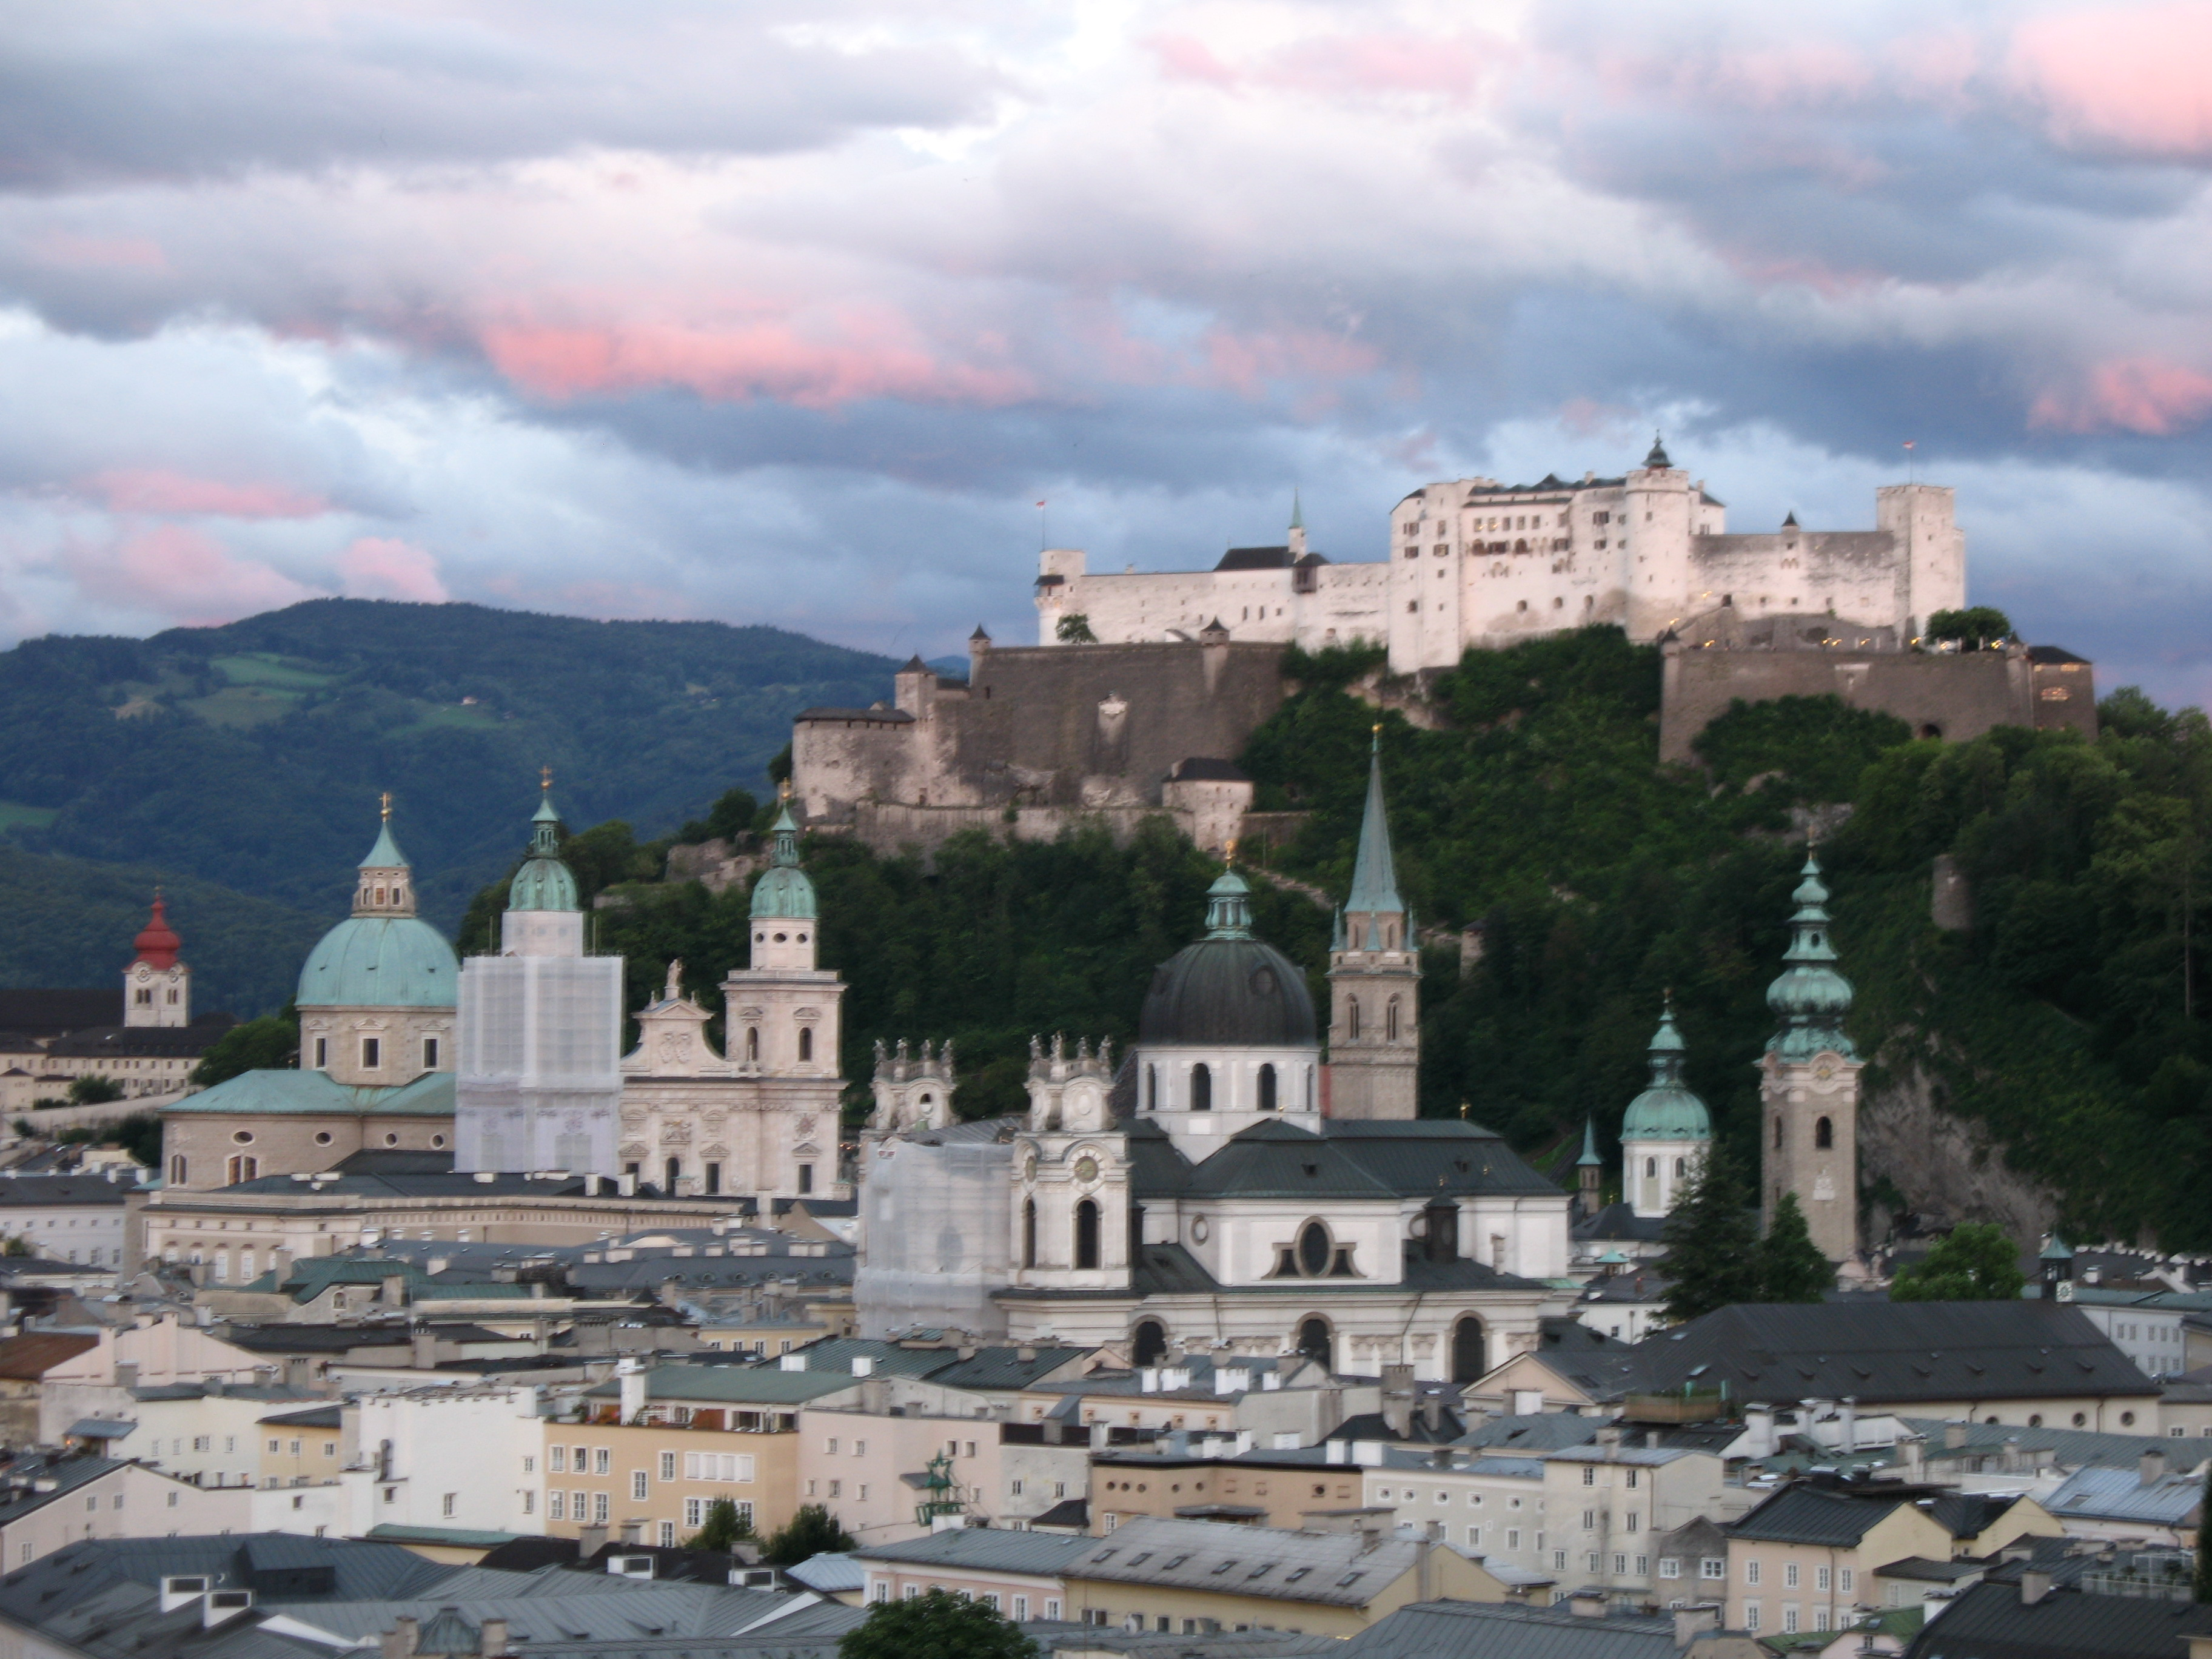 external image 1907_-_Salzburg_-_View_from_M%C3%B6nchsberg.JPG